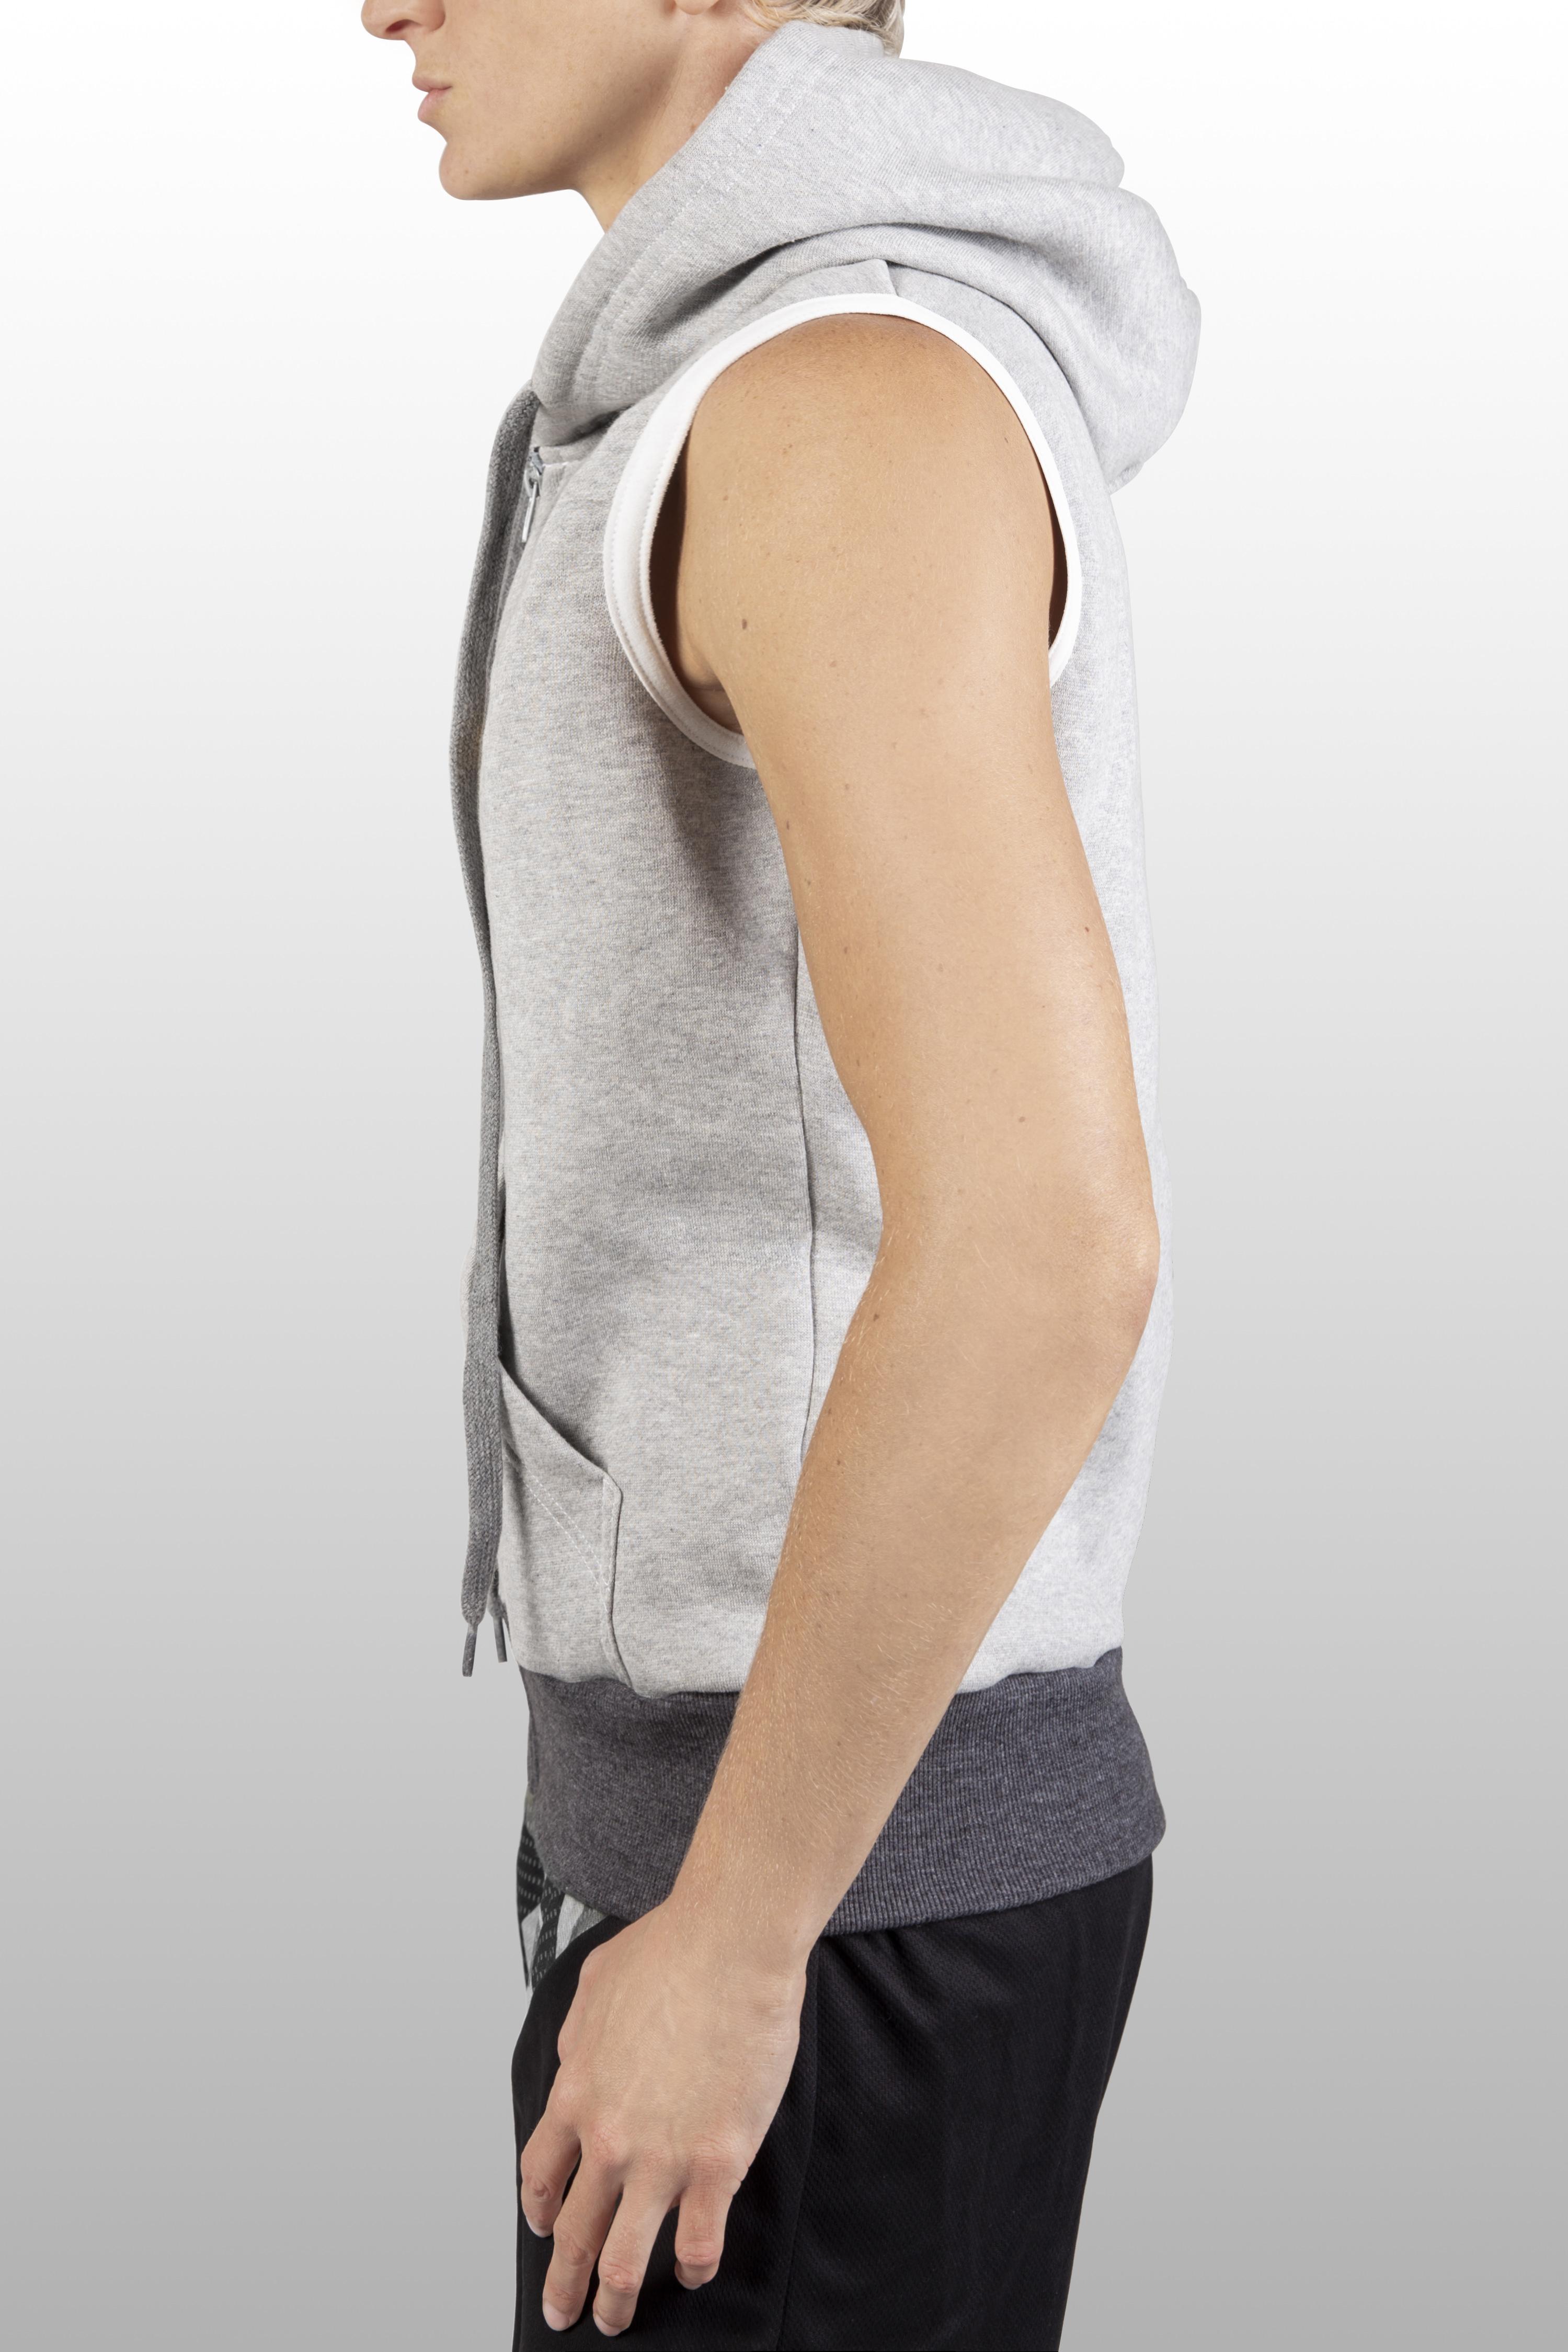 2xME unisex hoodie light grey